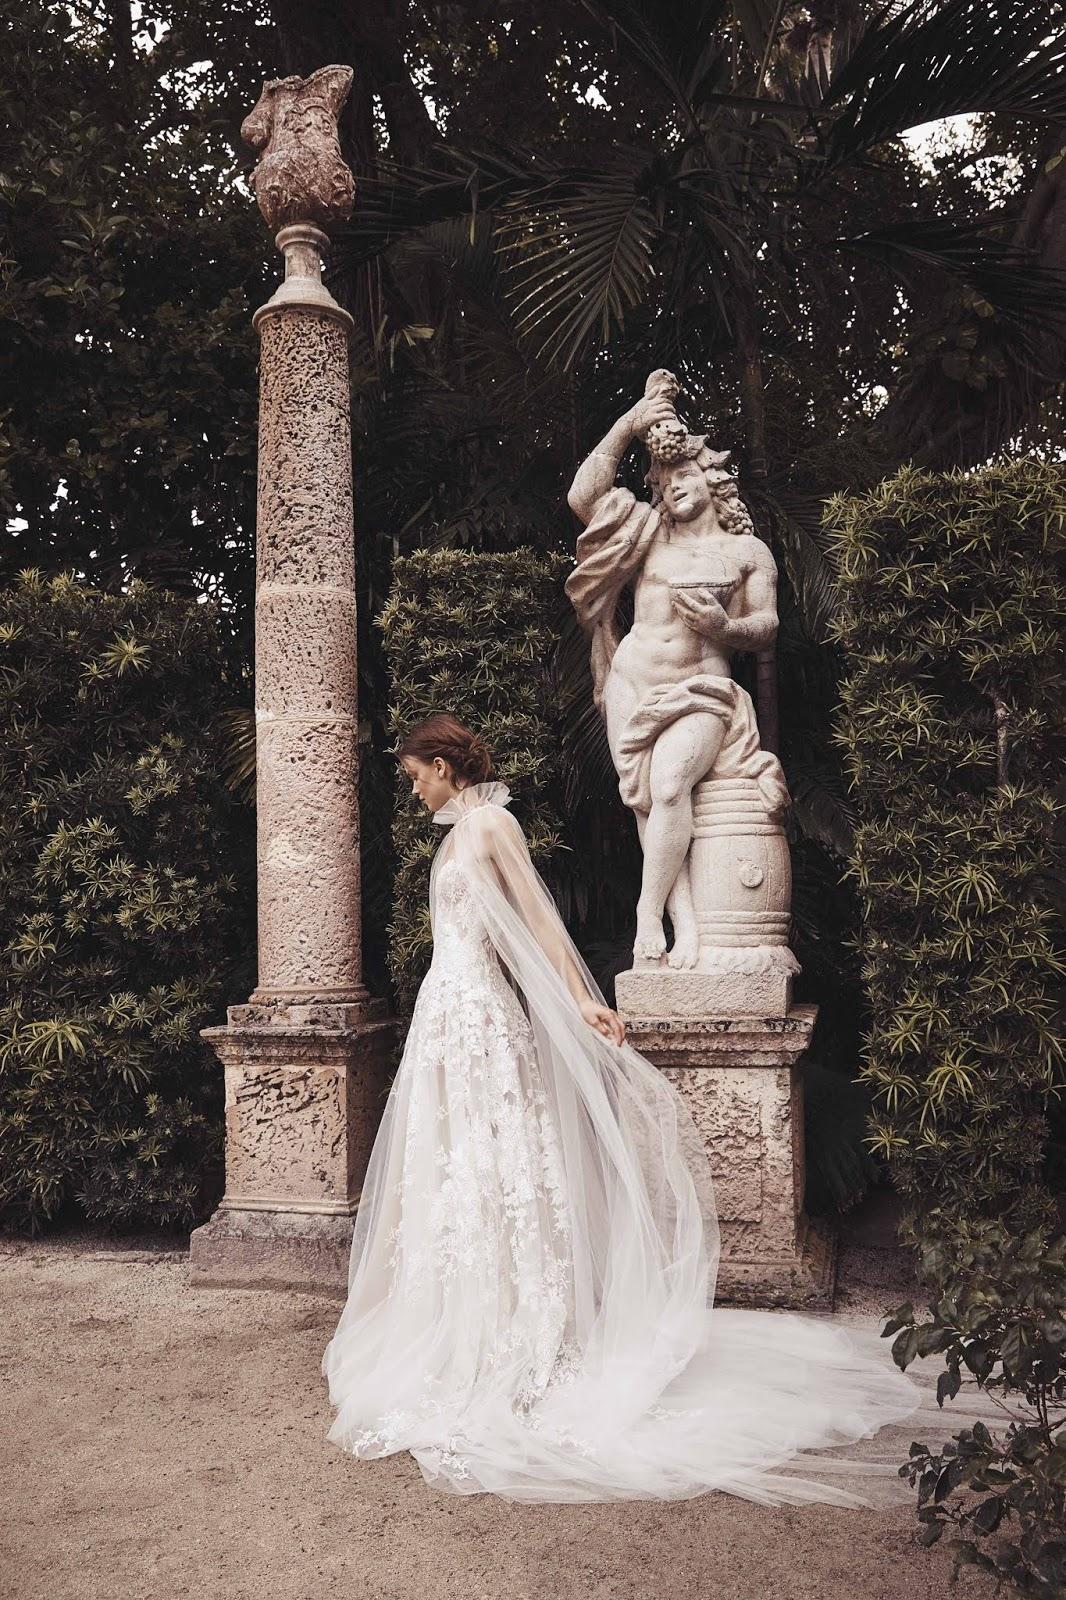 Lush Advent Calendar 2020 Monique Lhuillier Bridal Spring 2020   A Lush Collection Designed